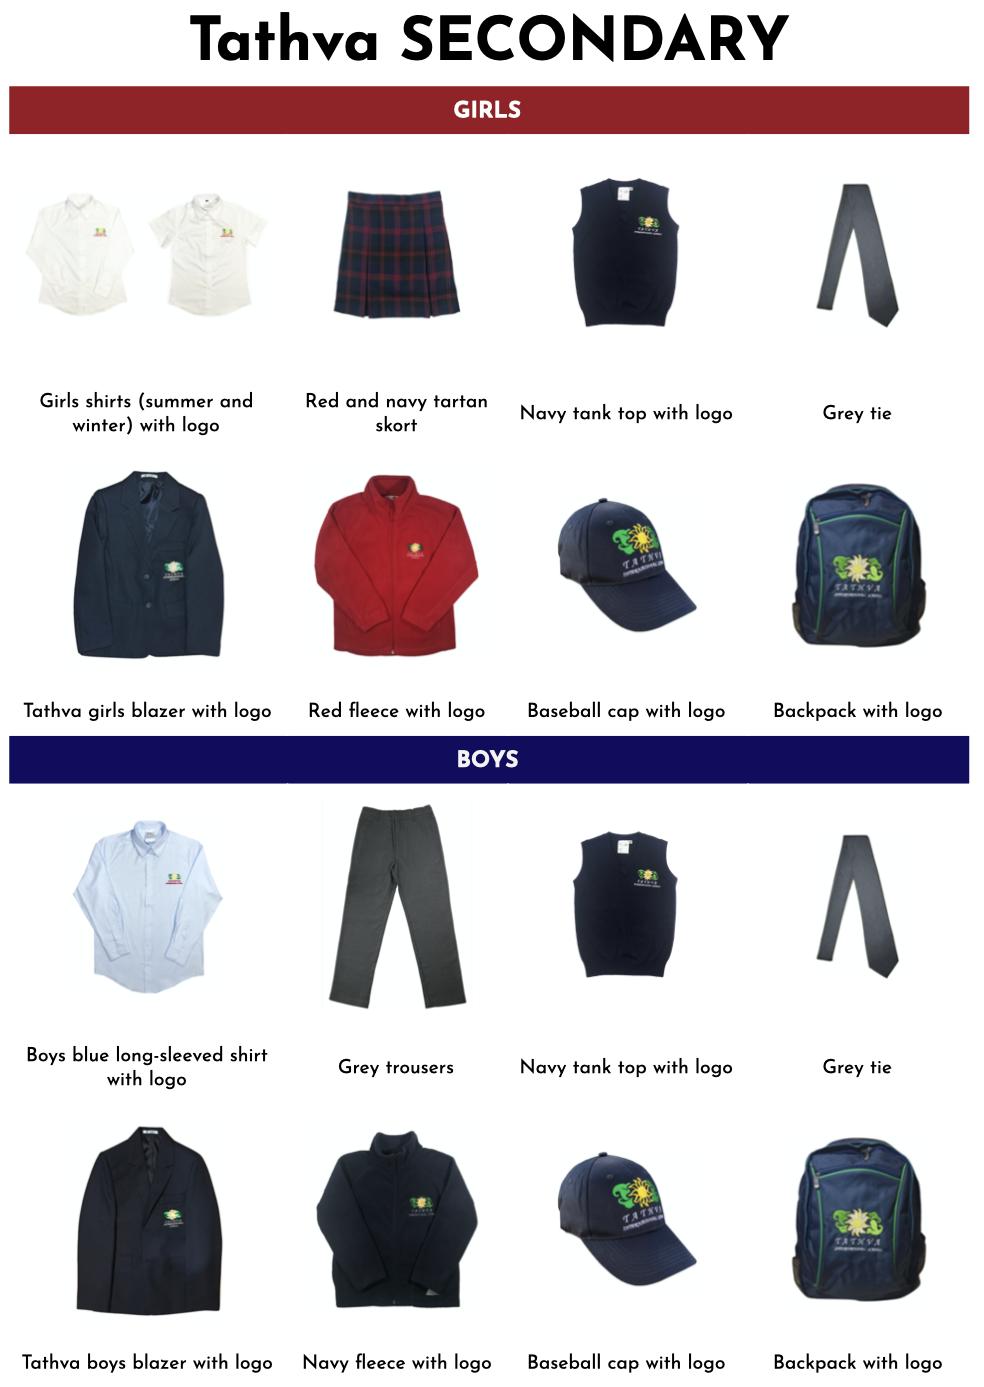 tathva-uniform-guide-2020-3-new-one.png